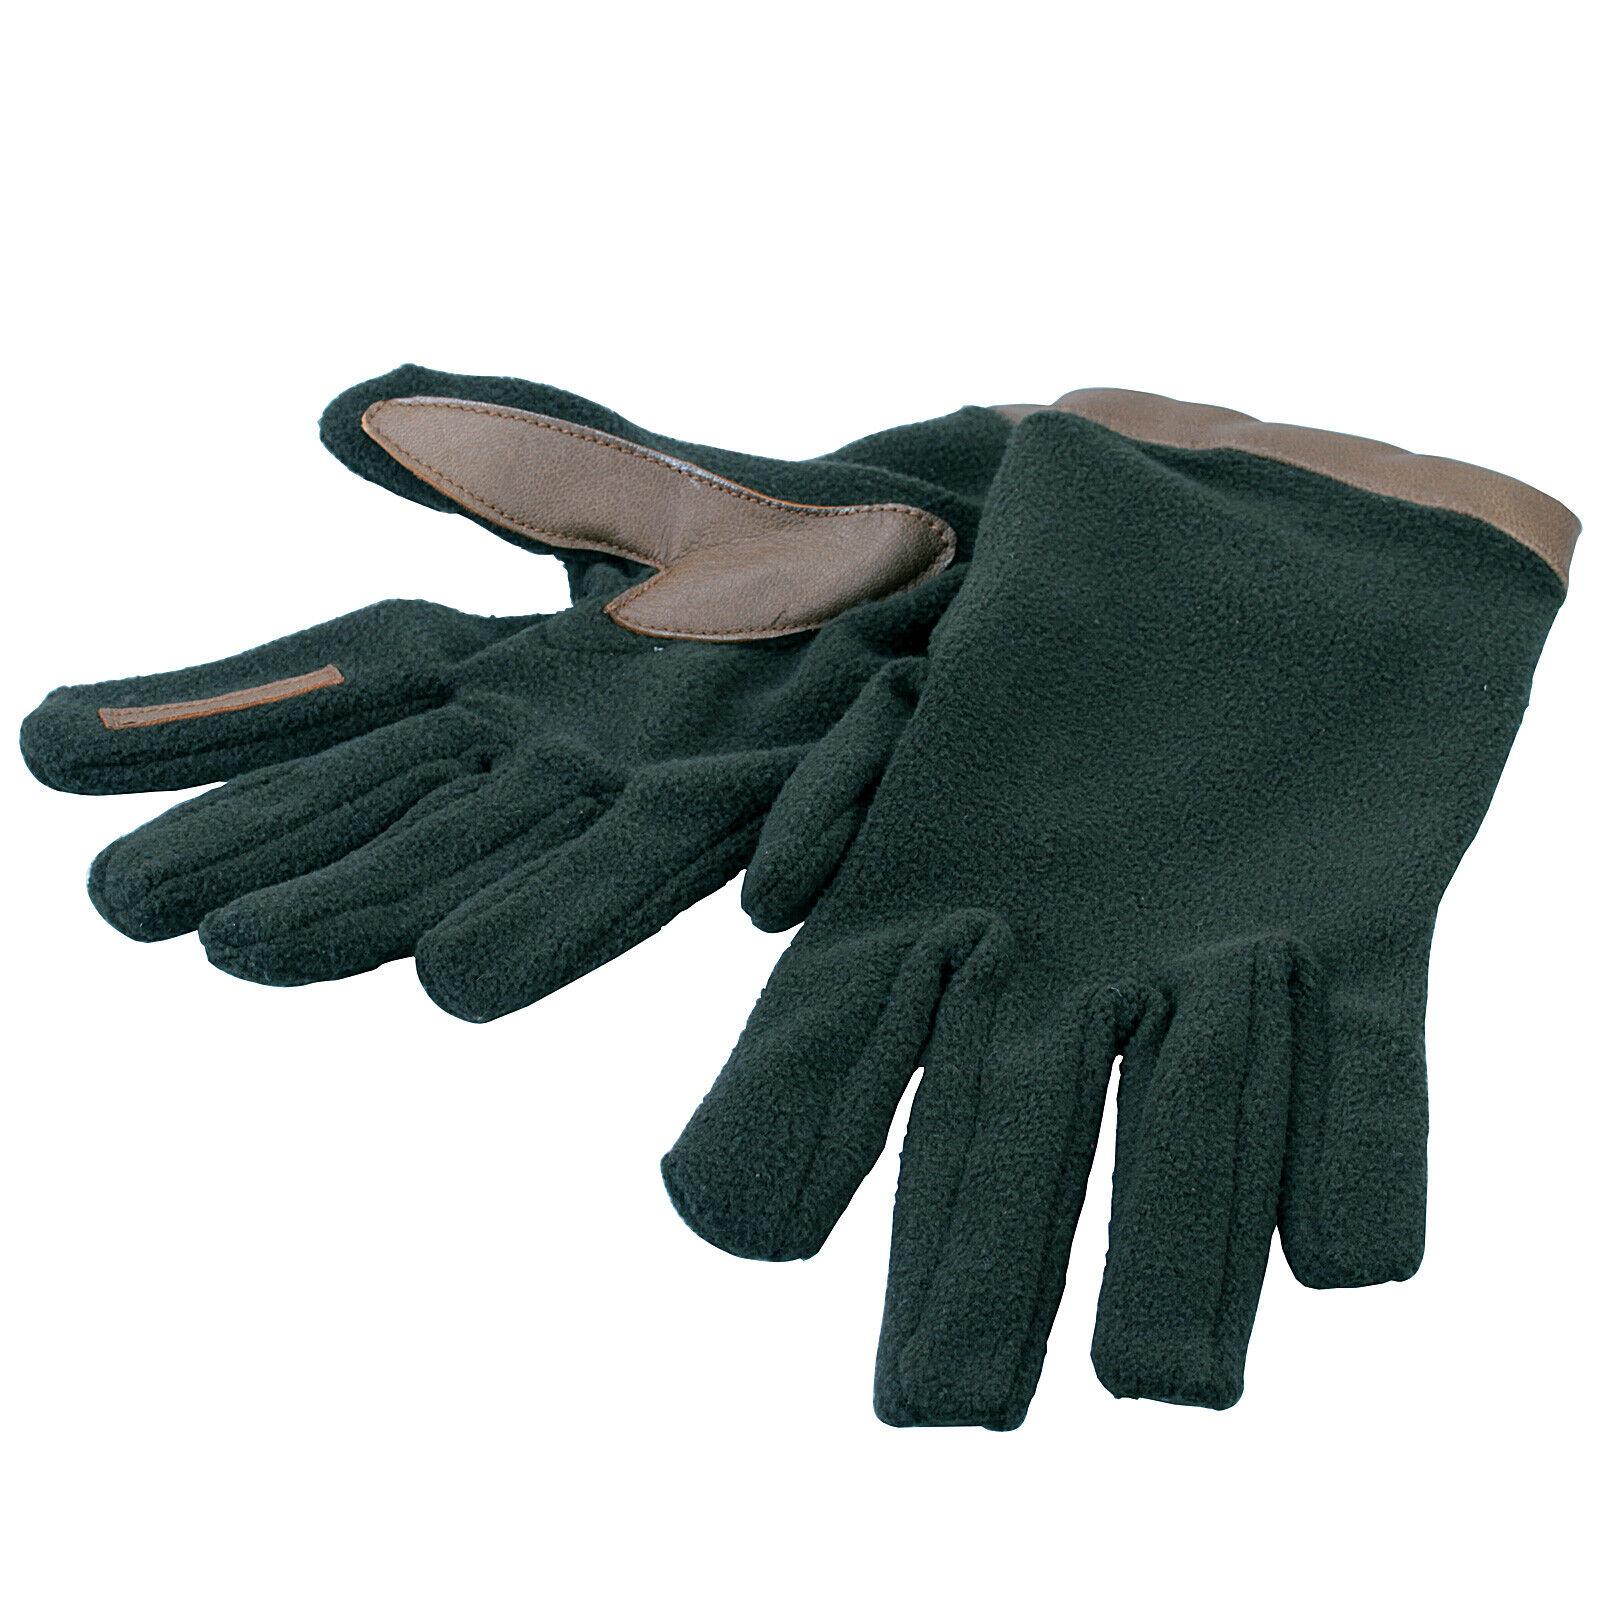 Bisley Fleece & Leather Gloves Green Thermal Mitts Men Women Small Medium Large